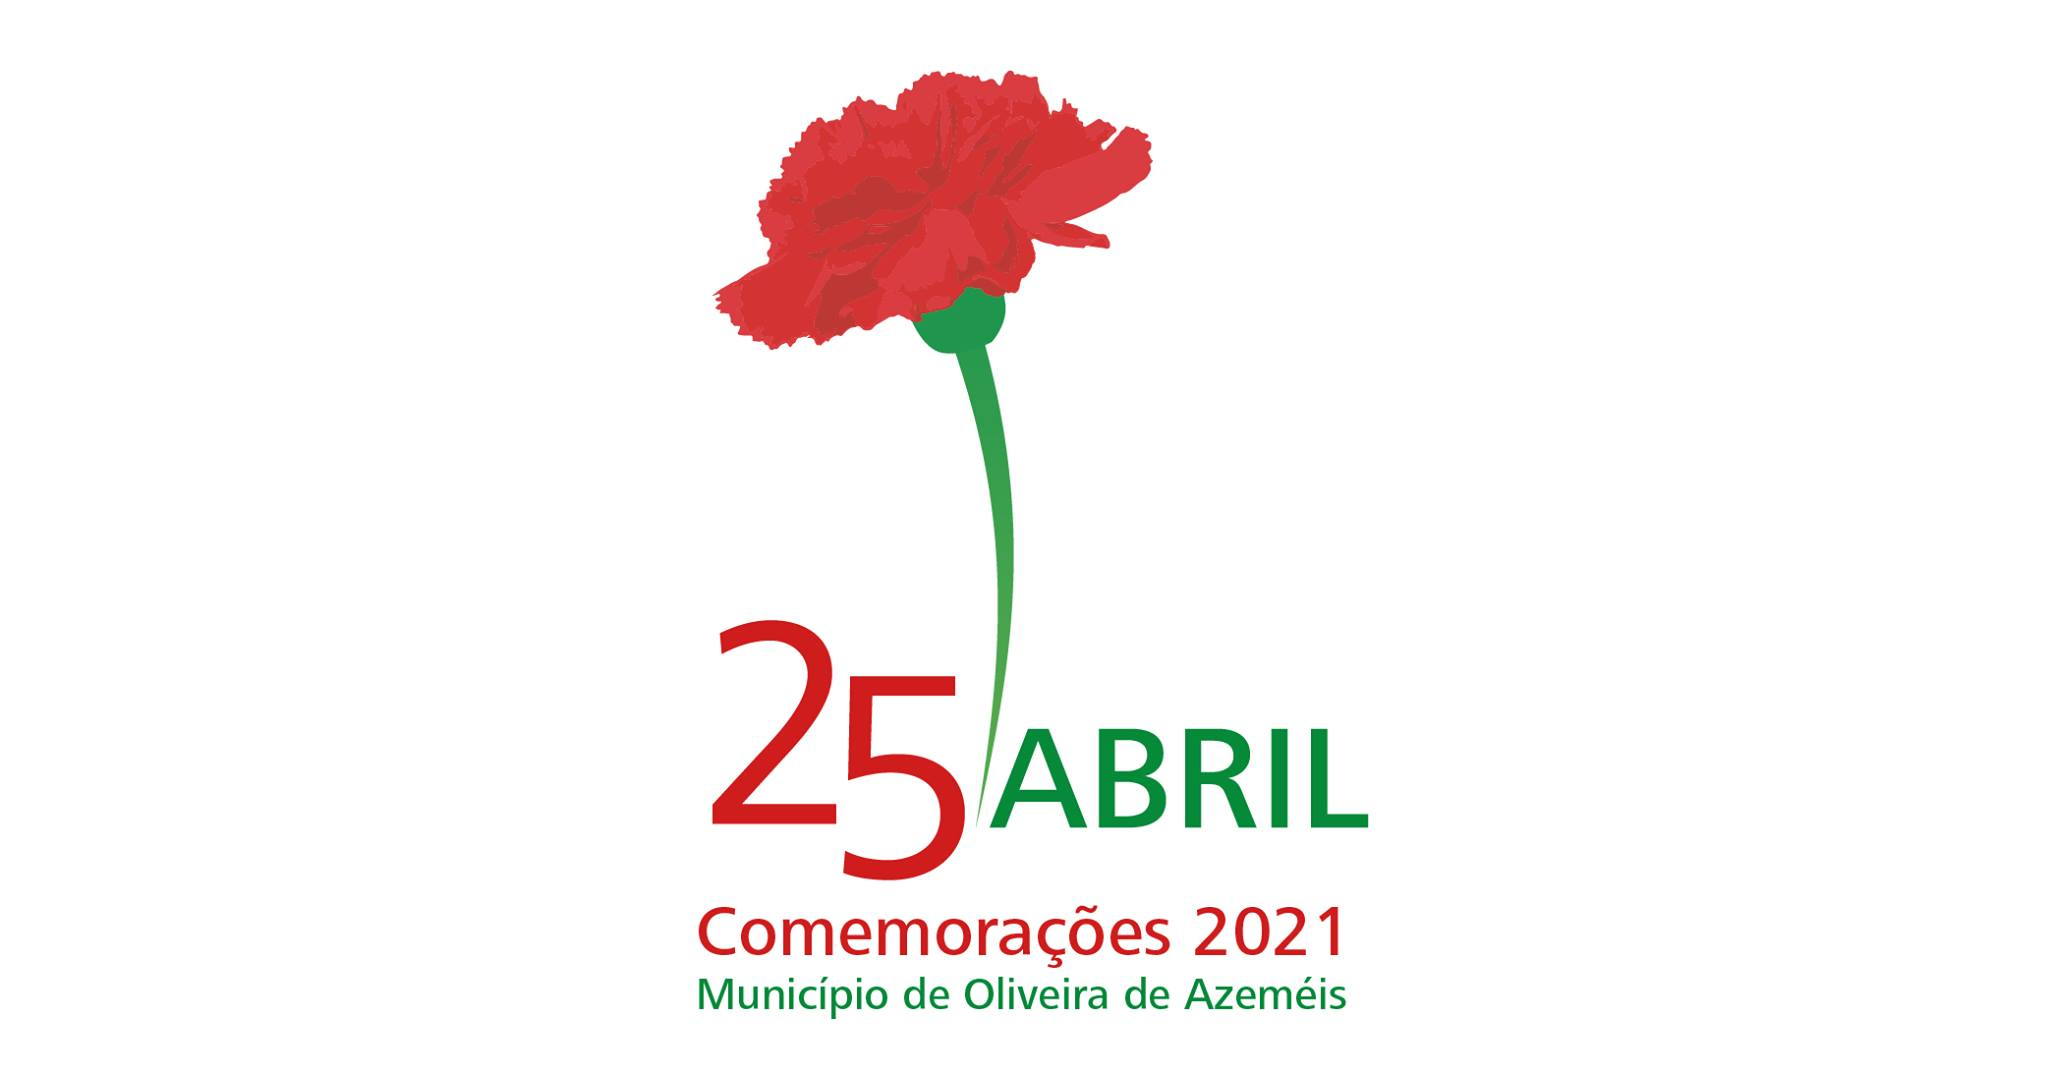 Concerto 25 de abril - Ensemble Instrumental da Banda de Música de Pinheiro da Bemposta